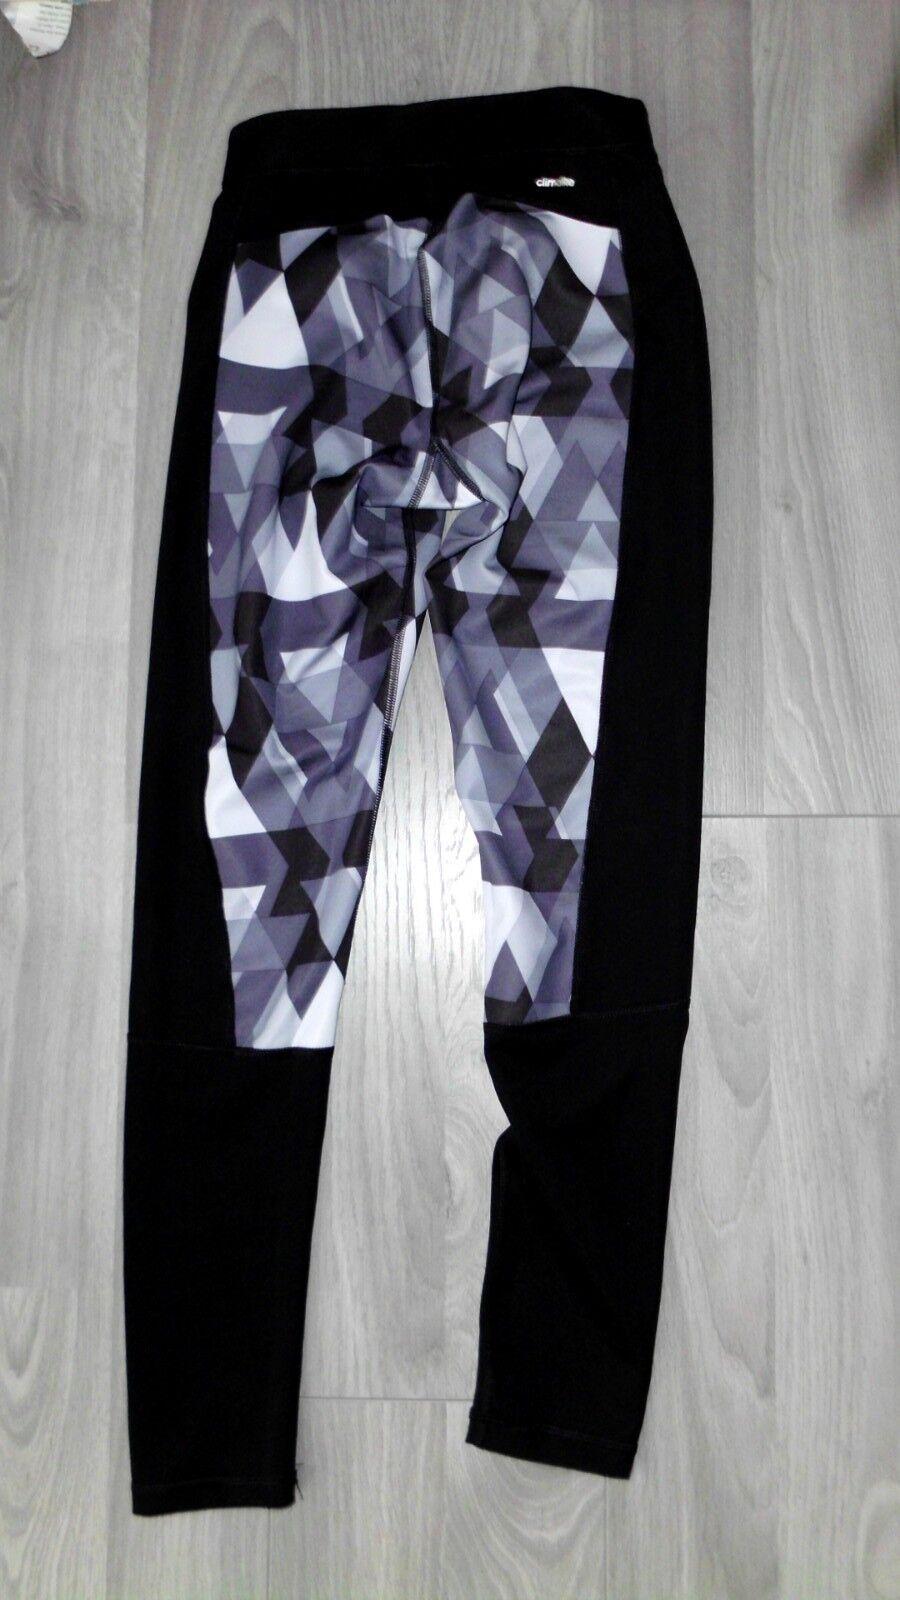 Adidas Leggins X S NEU schwarz Weiß Grau Fitness Sport Hose Blogger Climalite  | Online-Shop